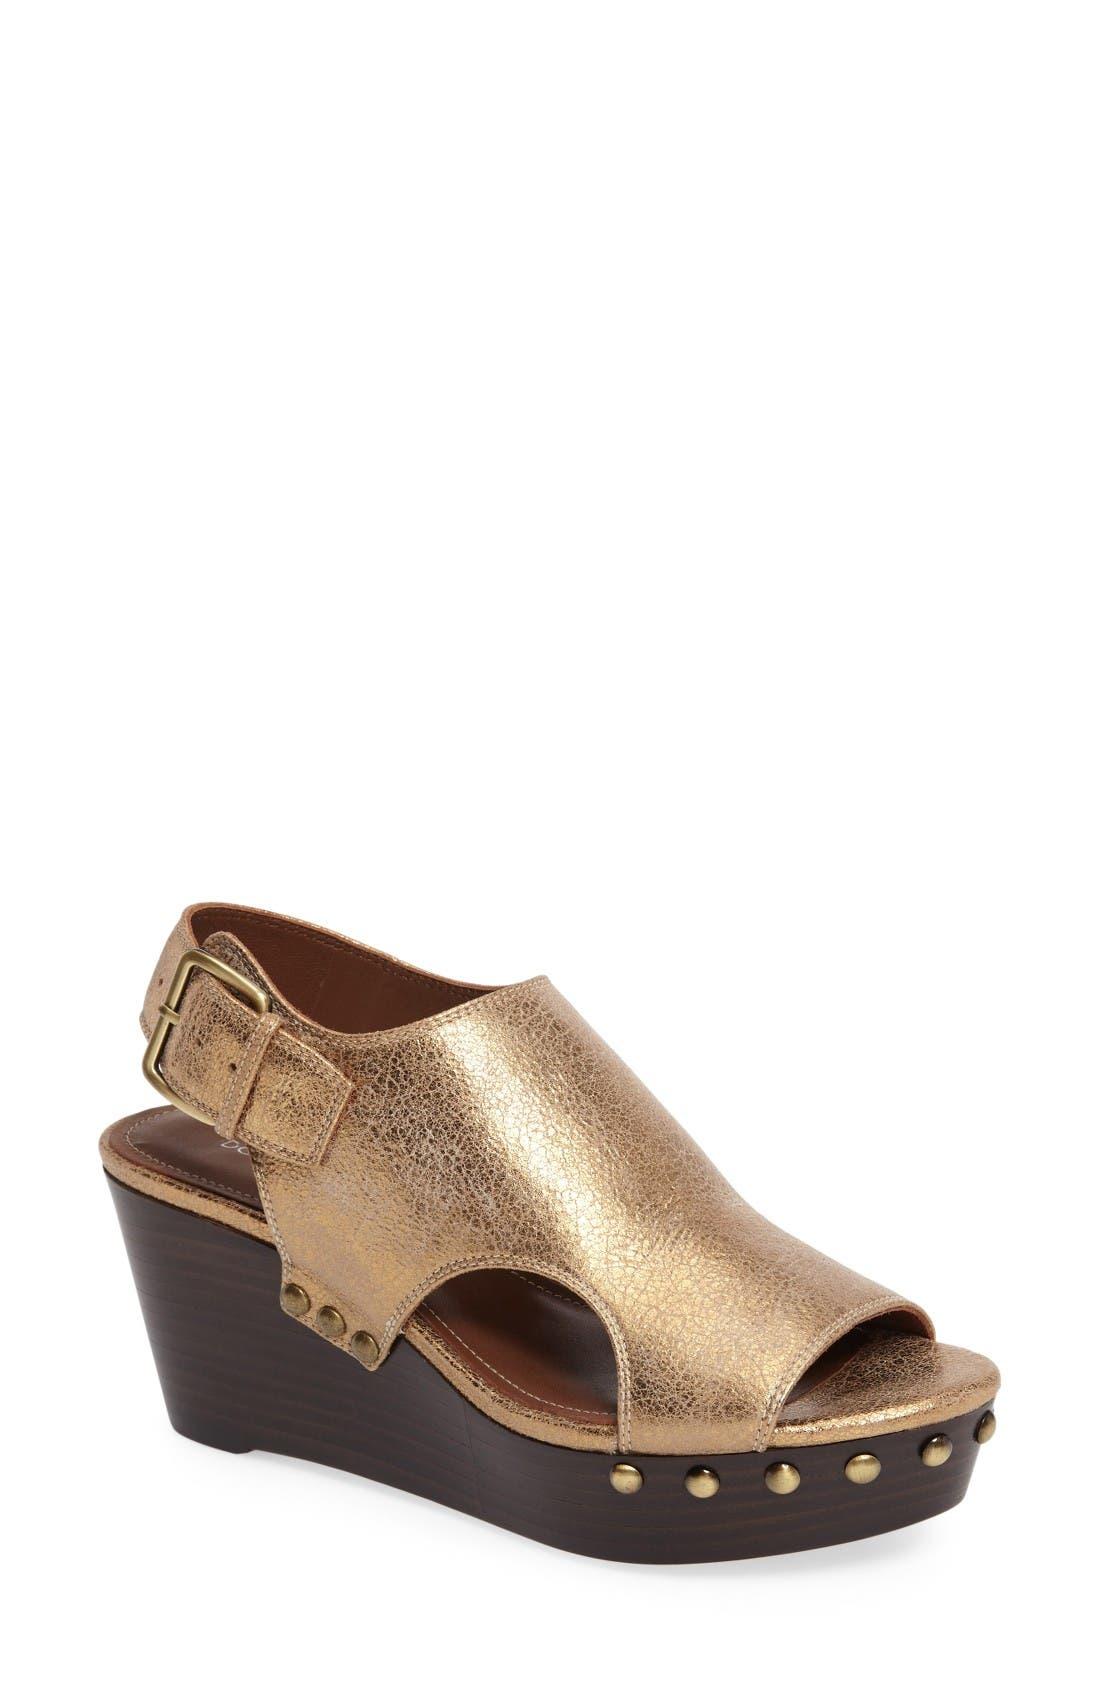 Donald J Pliner Fallon Platform Wedge Sandal (Women)